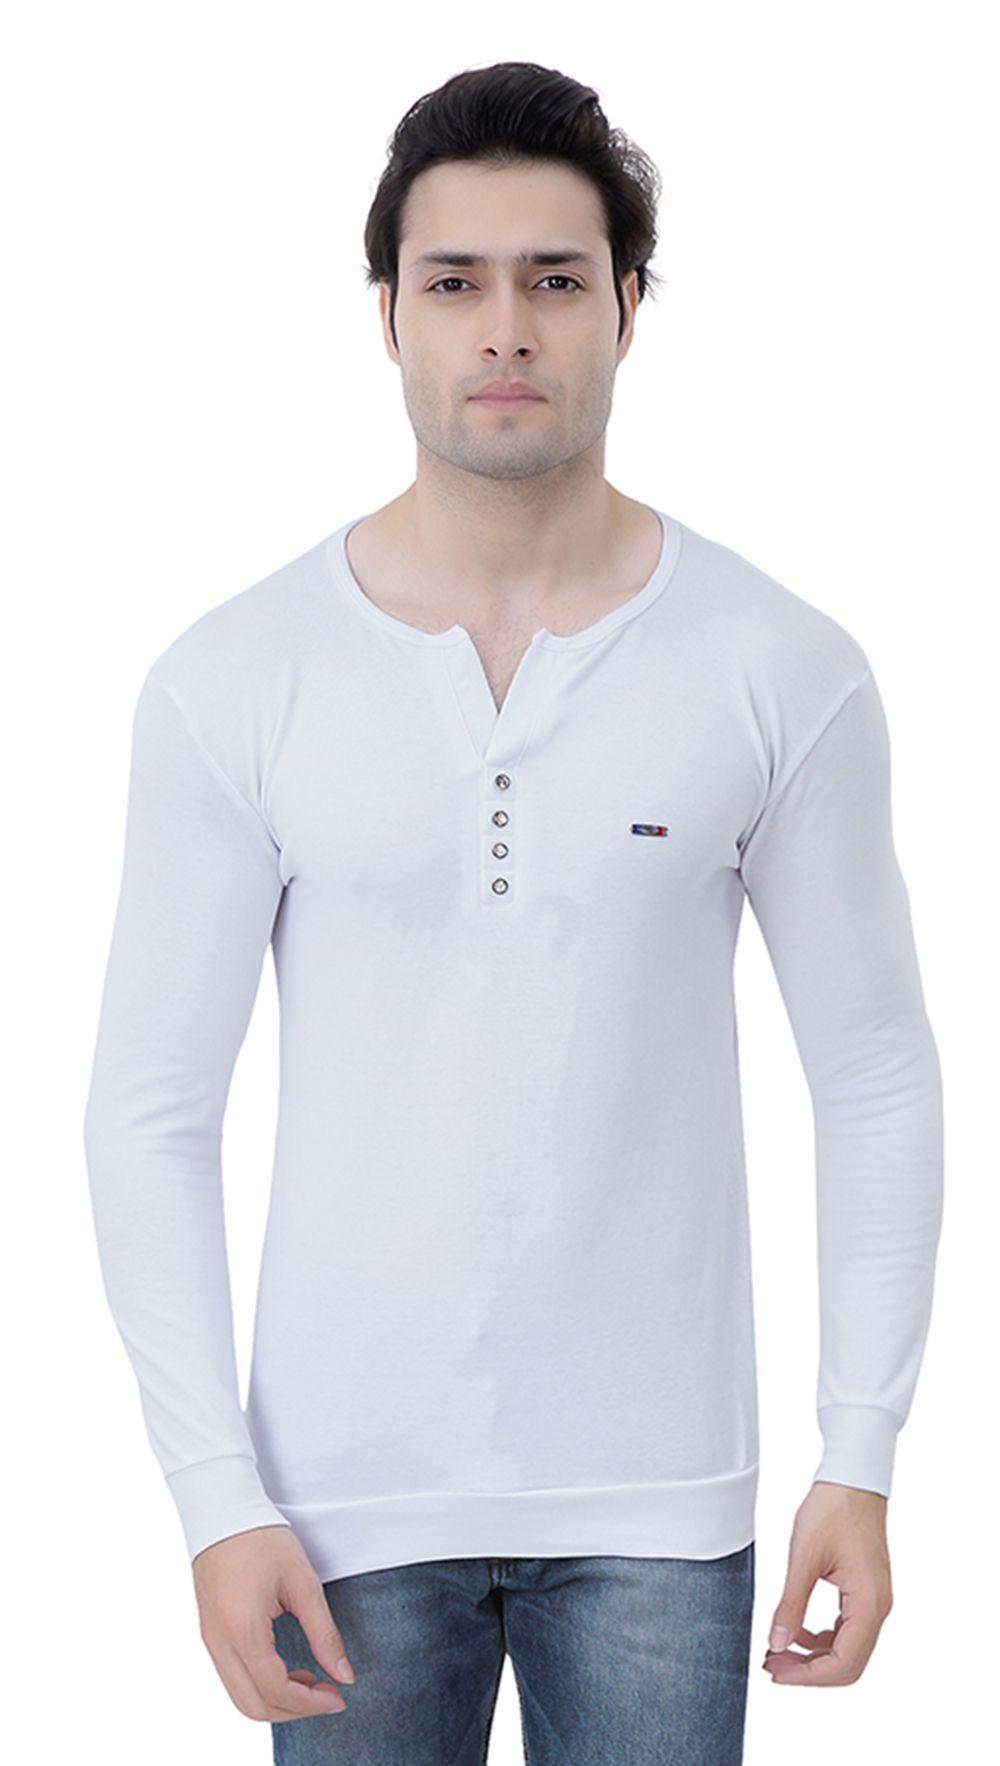 RoyalShoppingCart White Henley T-Shirt